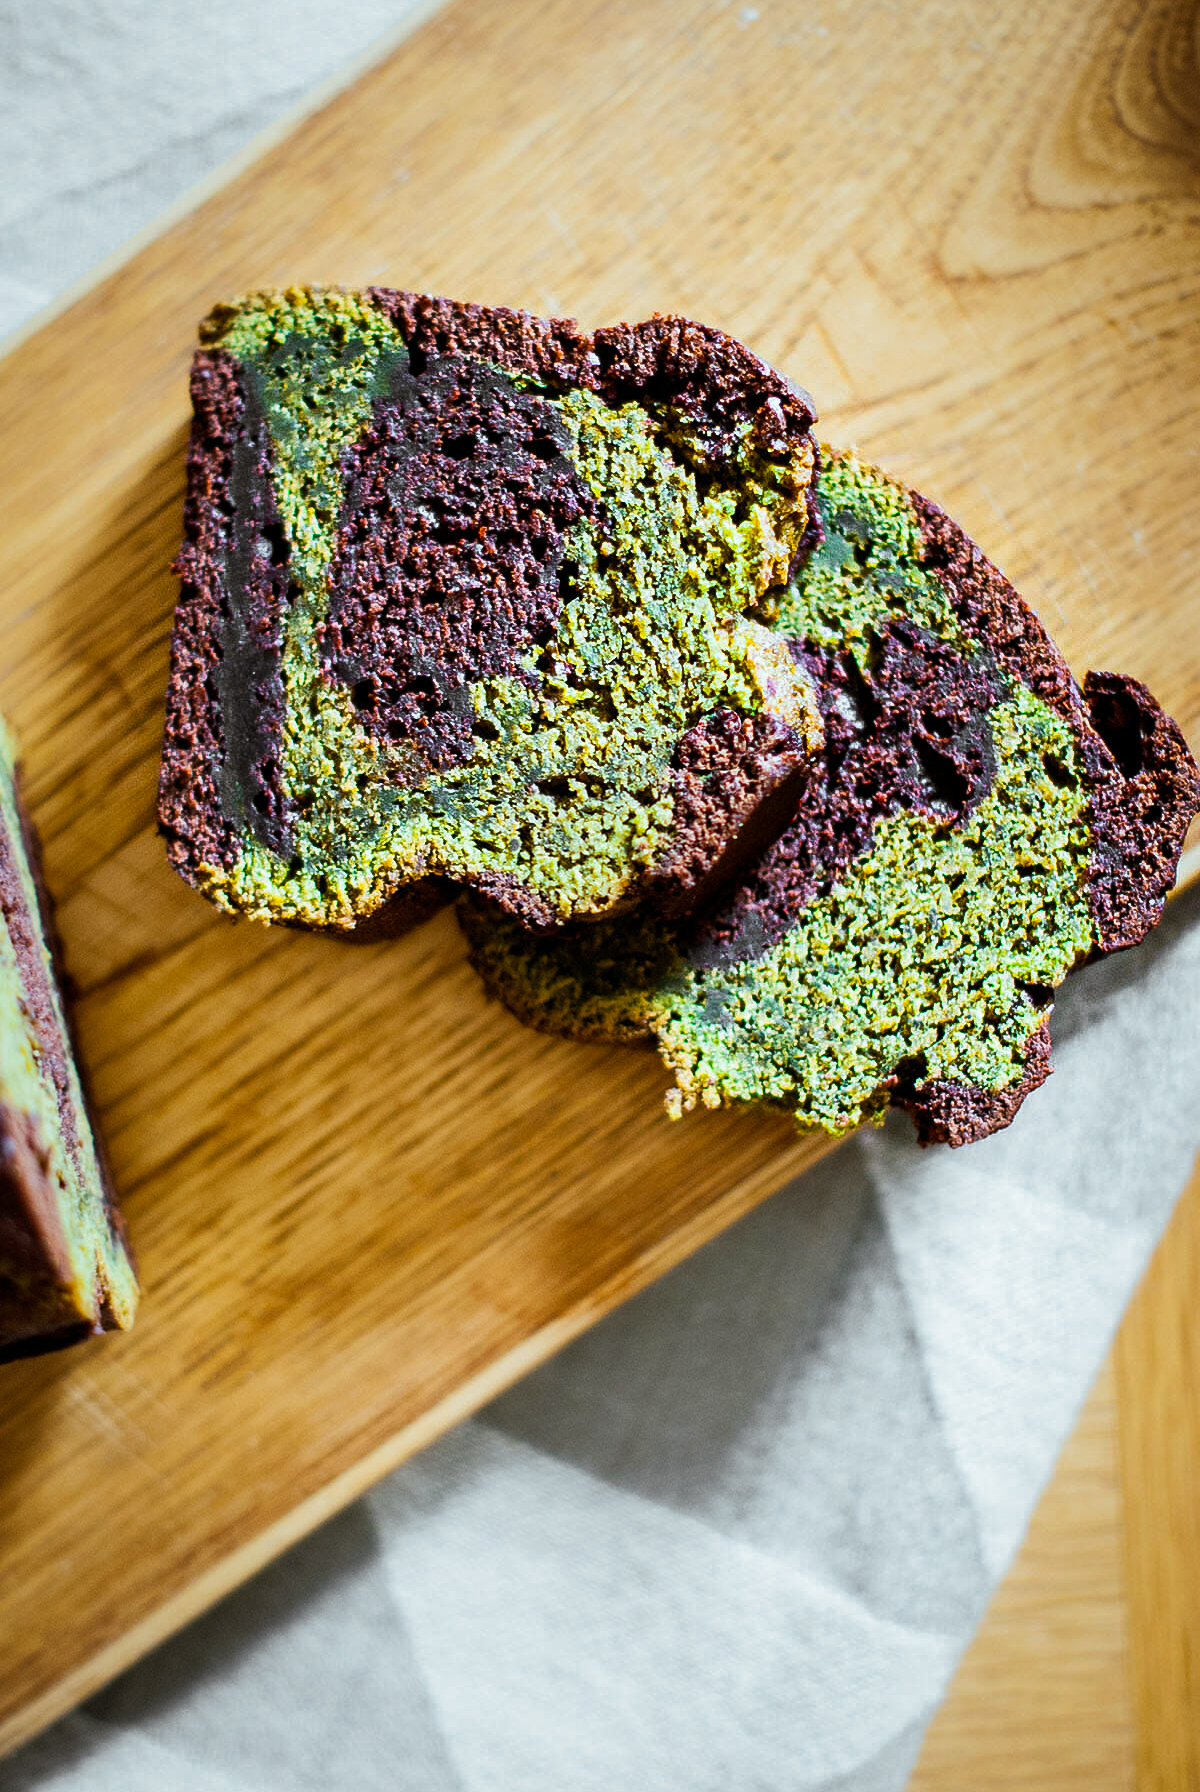 Cake matcha chocolat marbré part coupée - Lilie Bakery